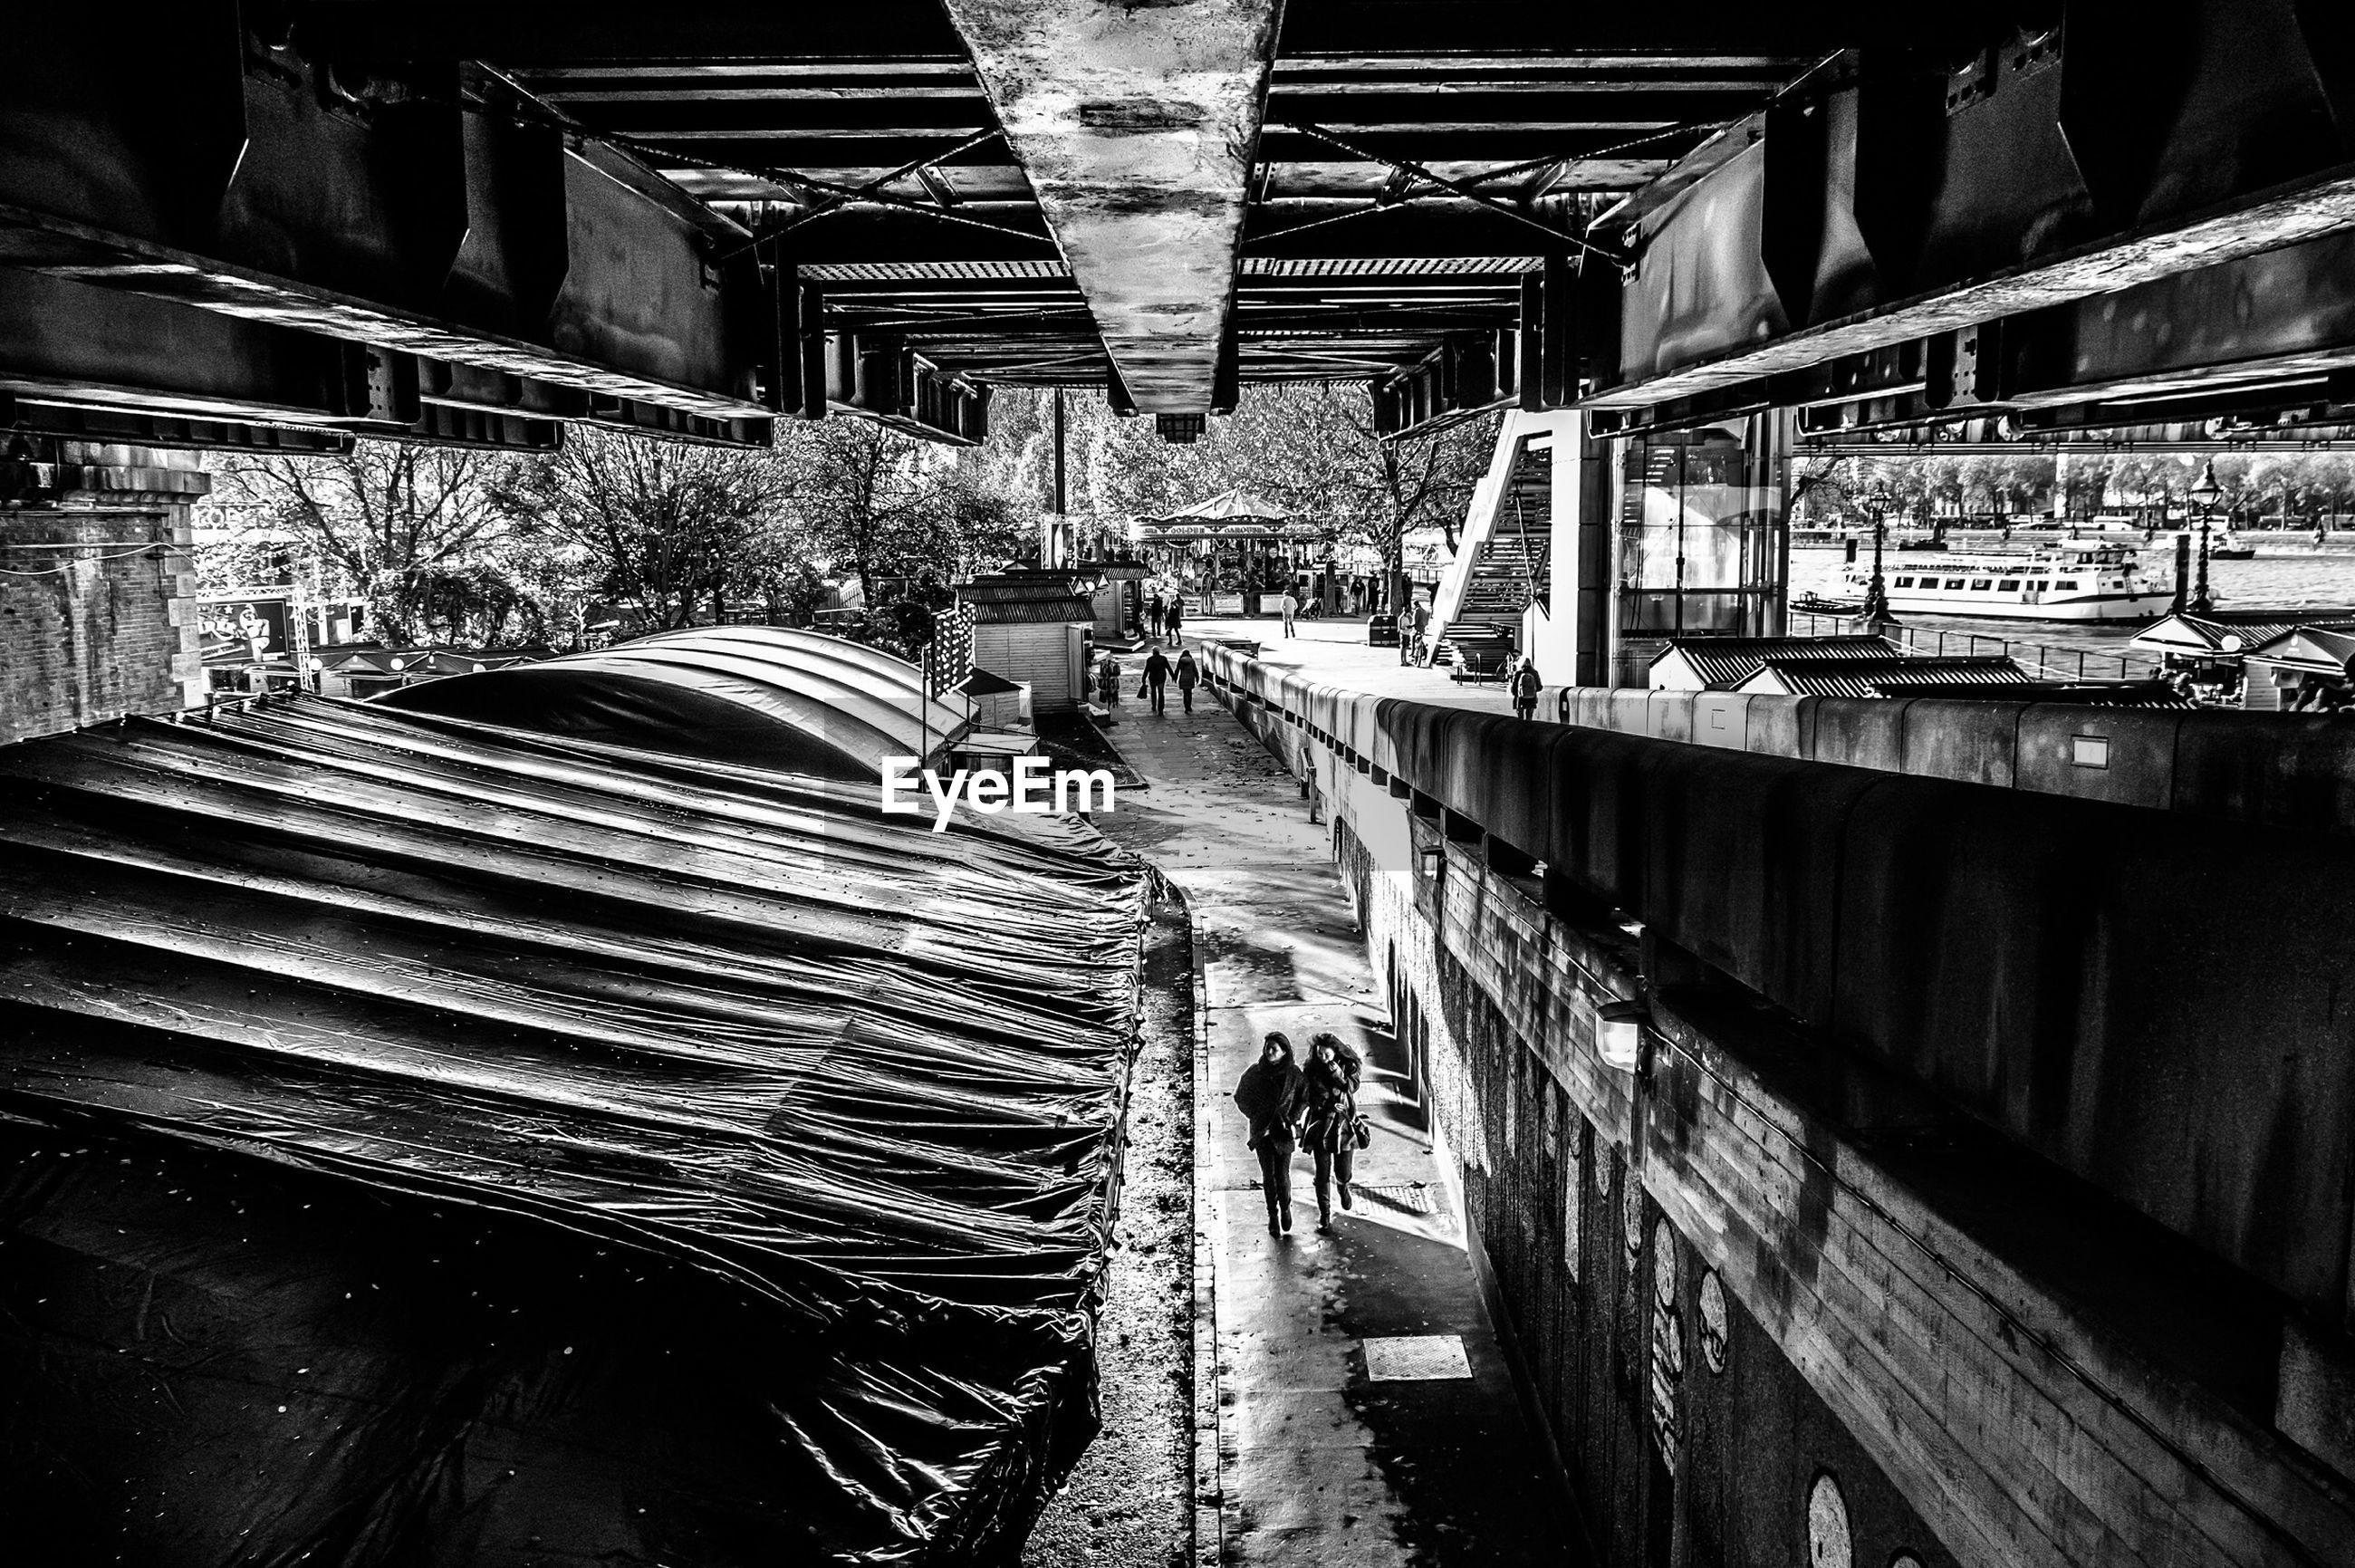 High angle view of women walking on street under bridge